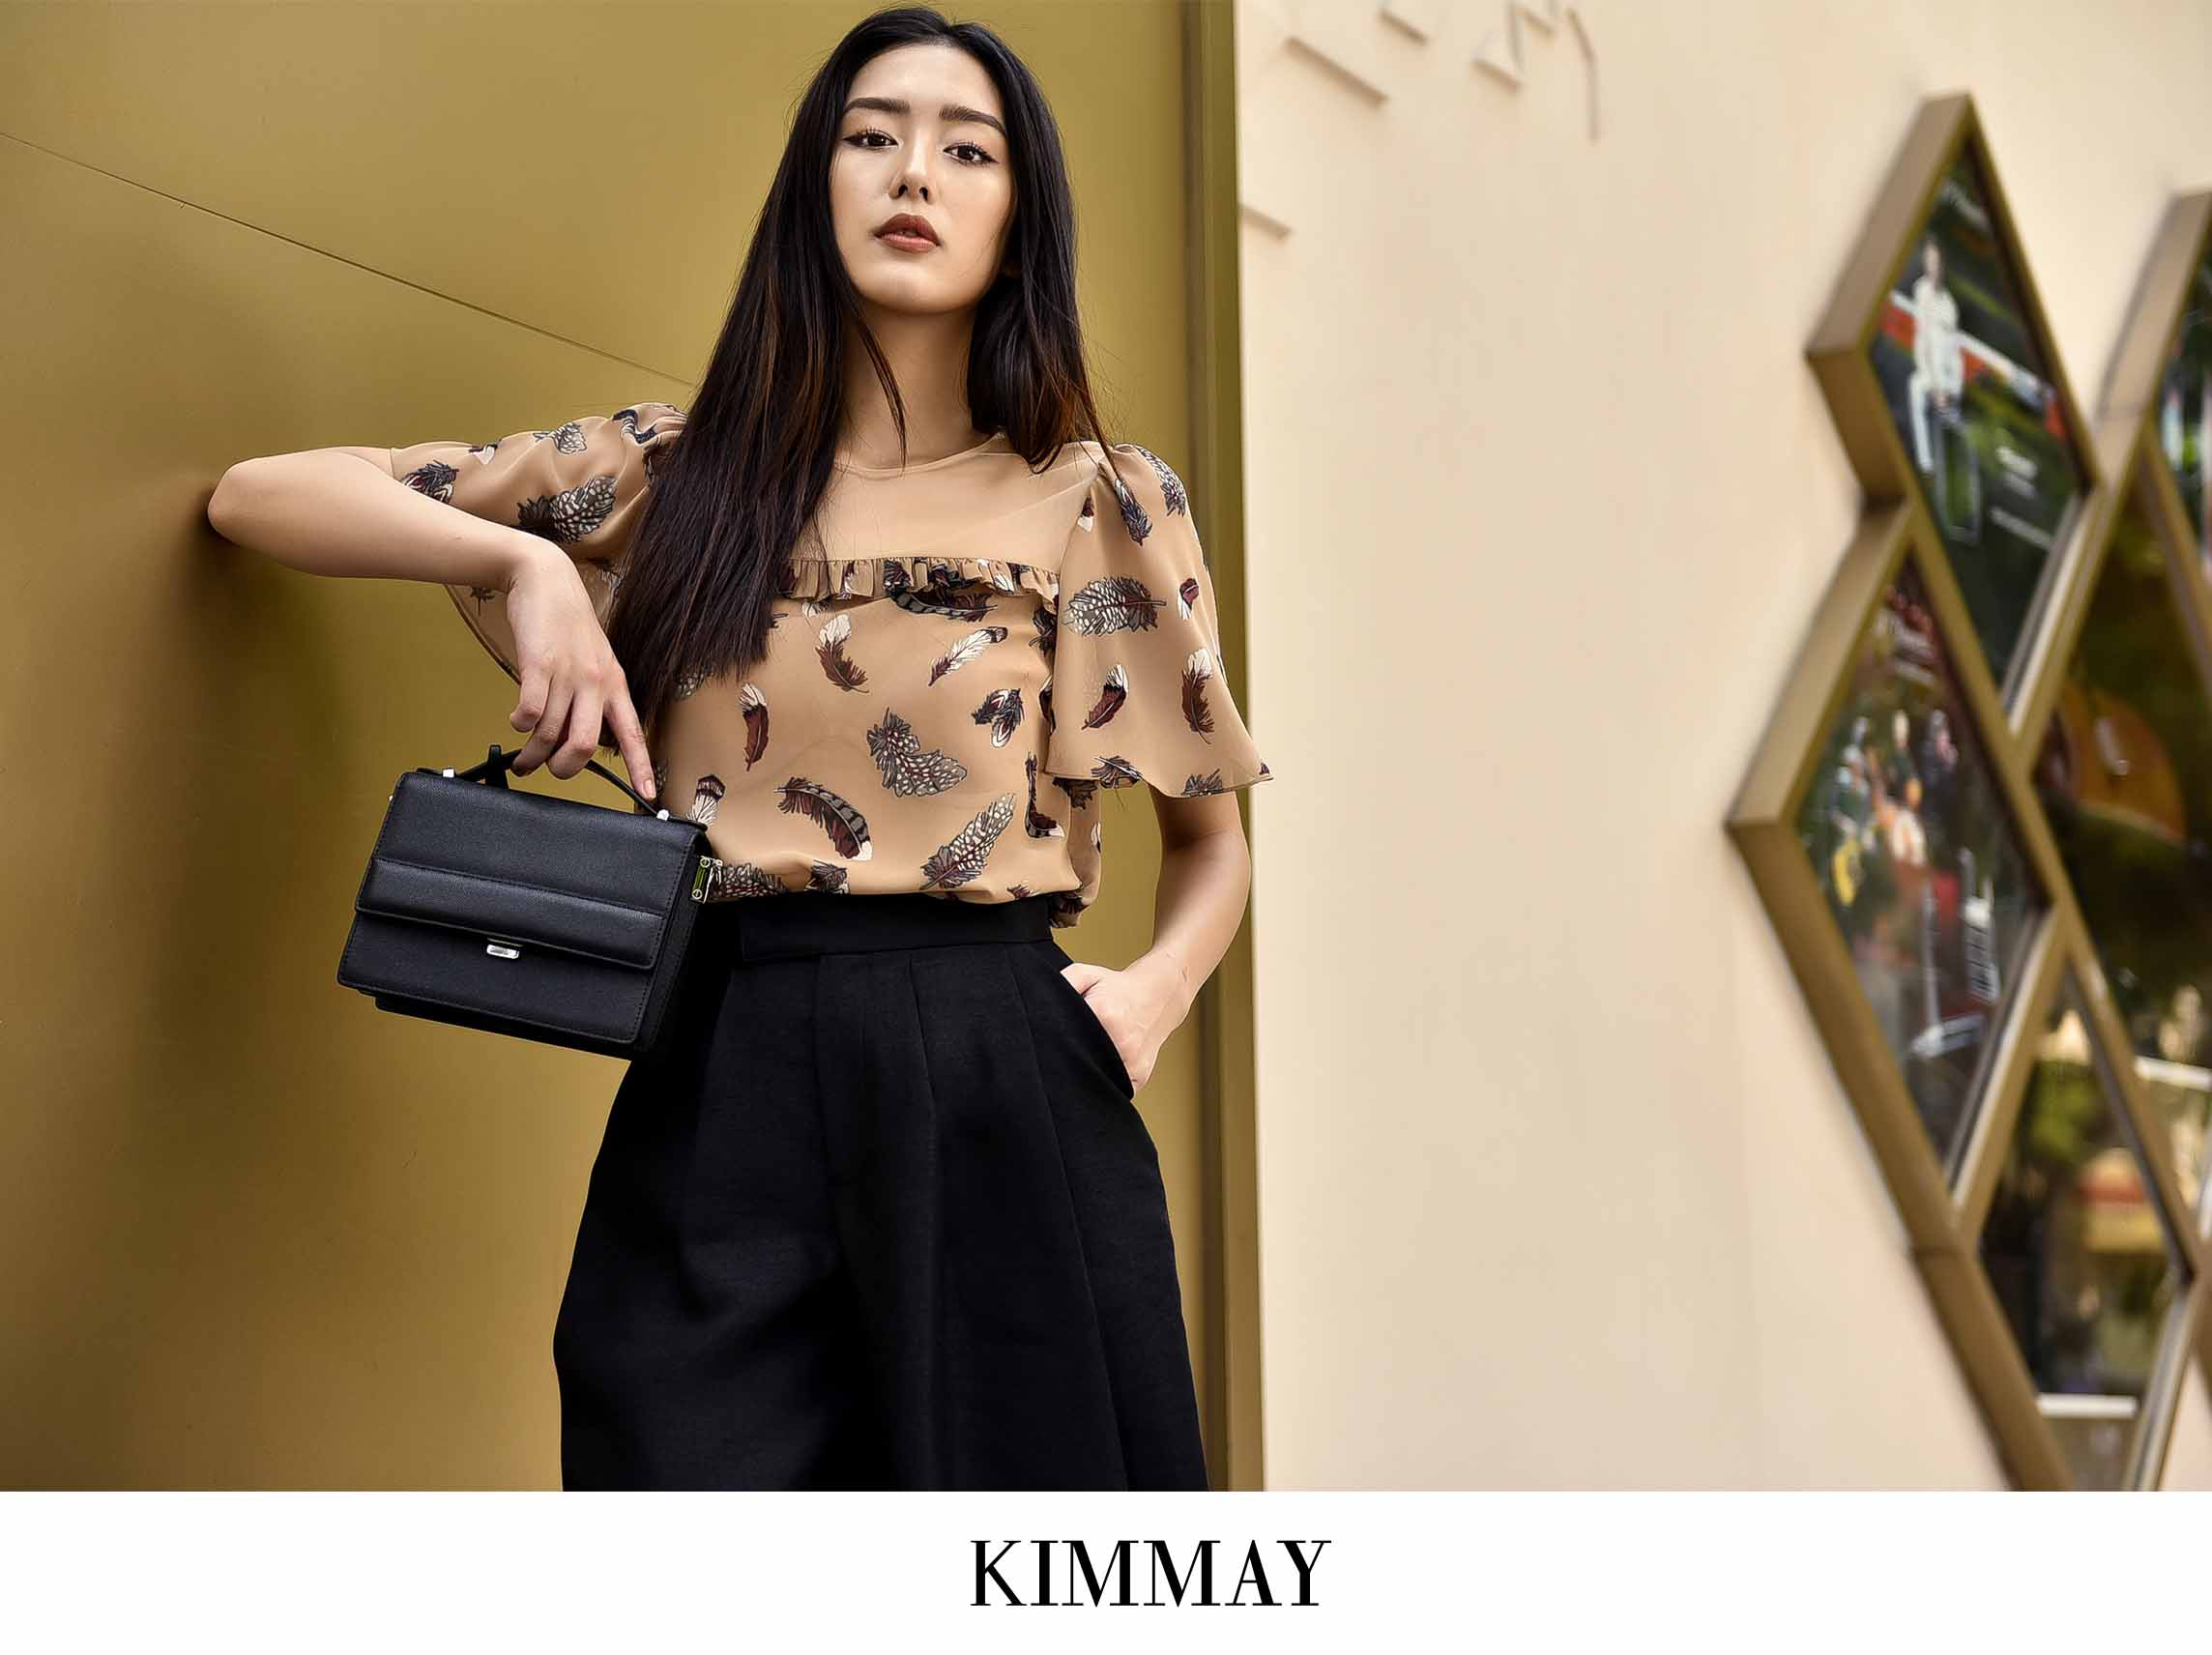 thuong hieu kimmay - elle vietnam (7)